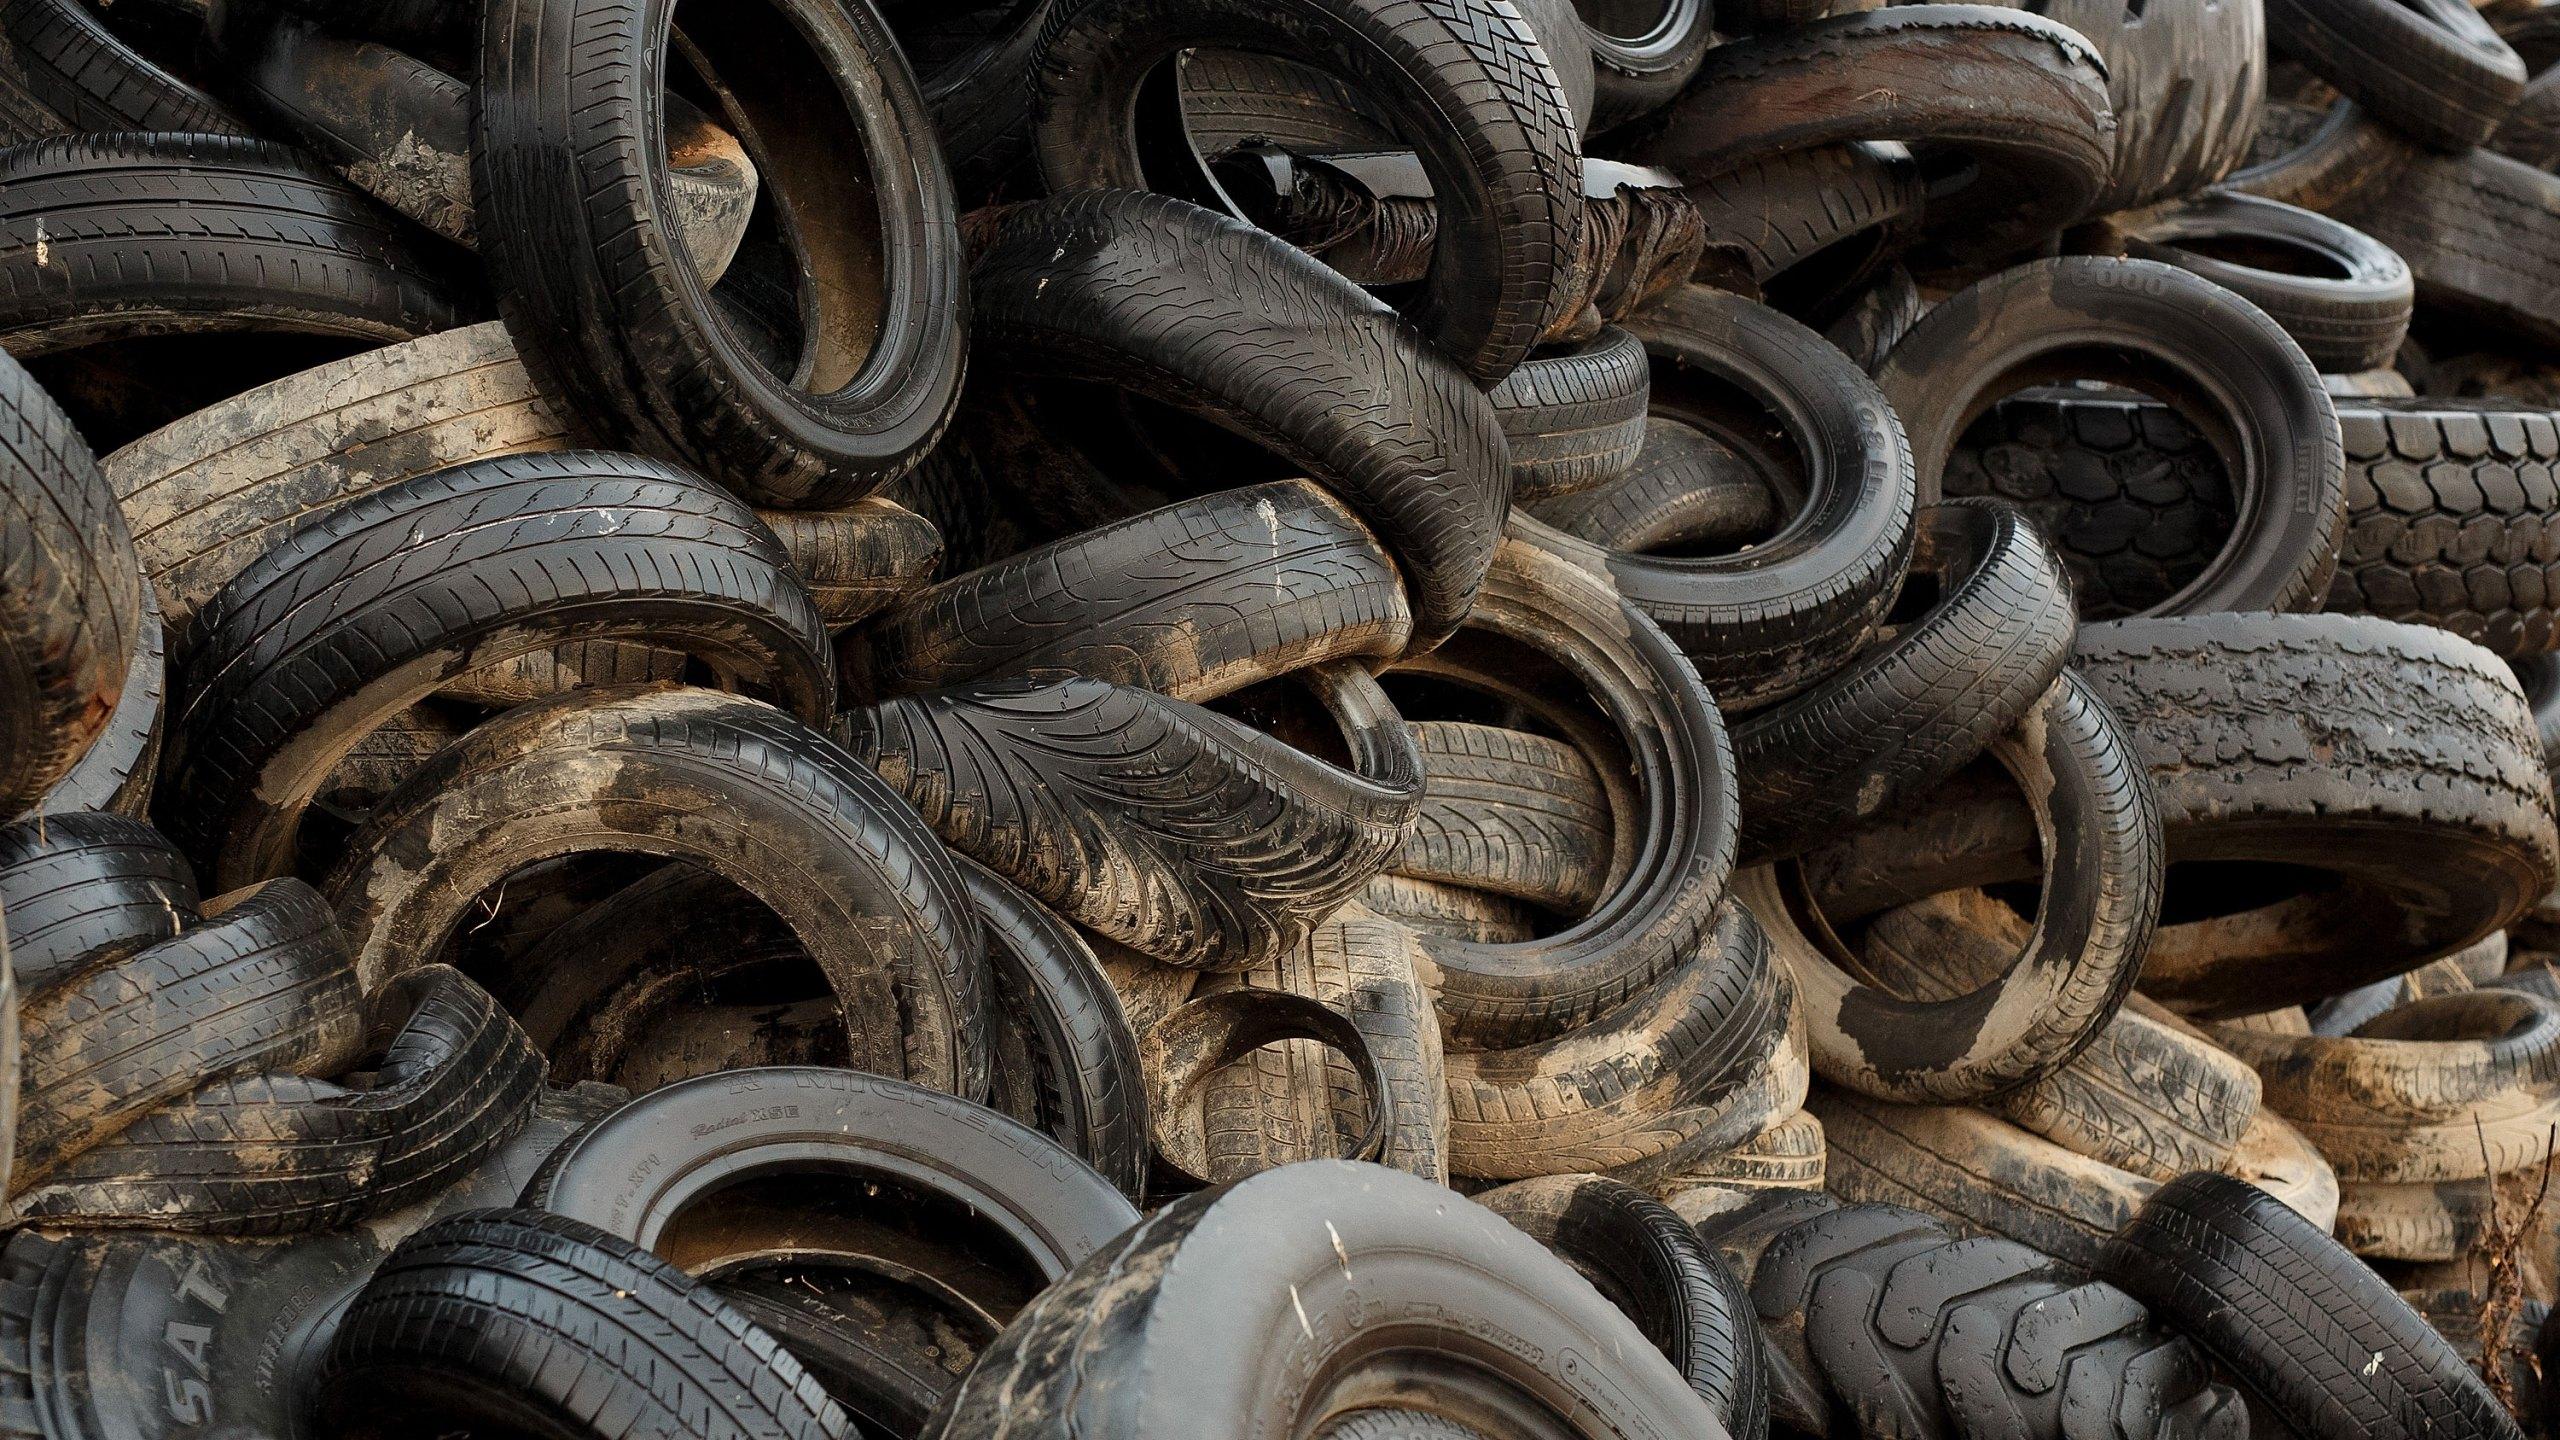 Tyre Dump In Spanish Countryside.jpg